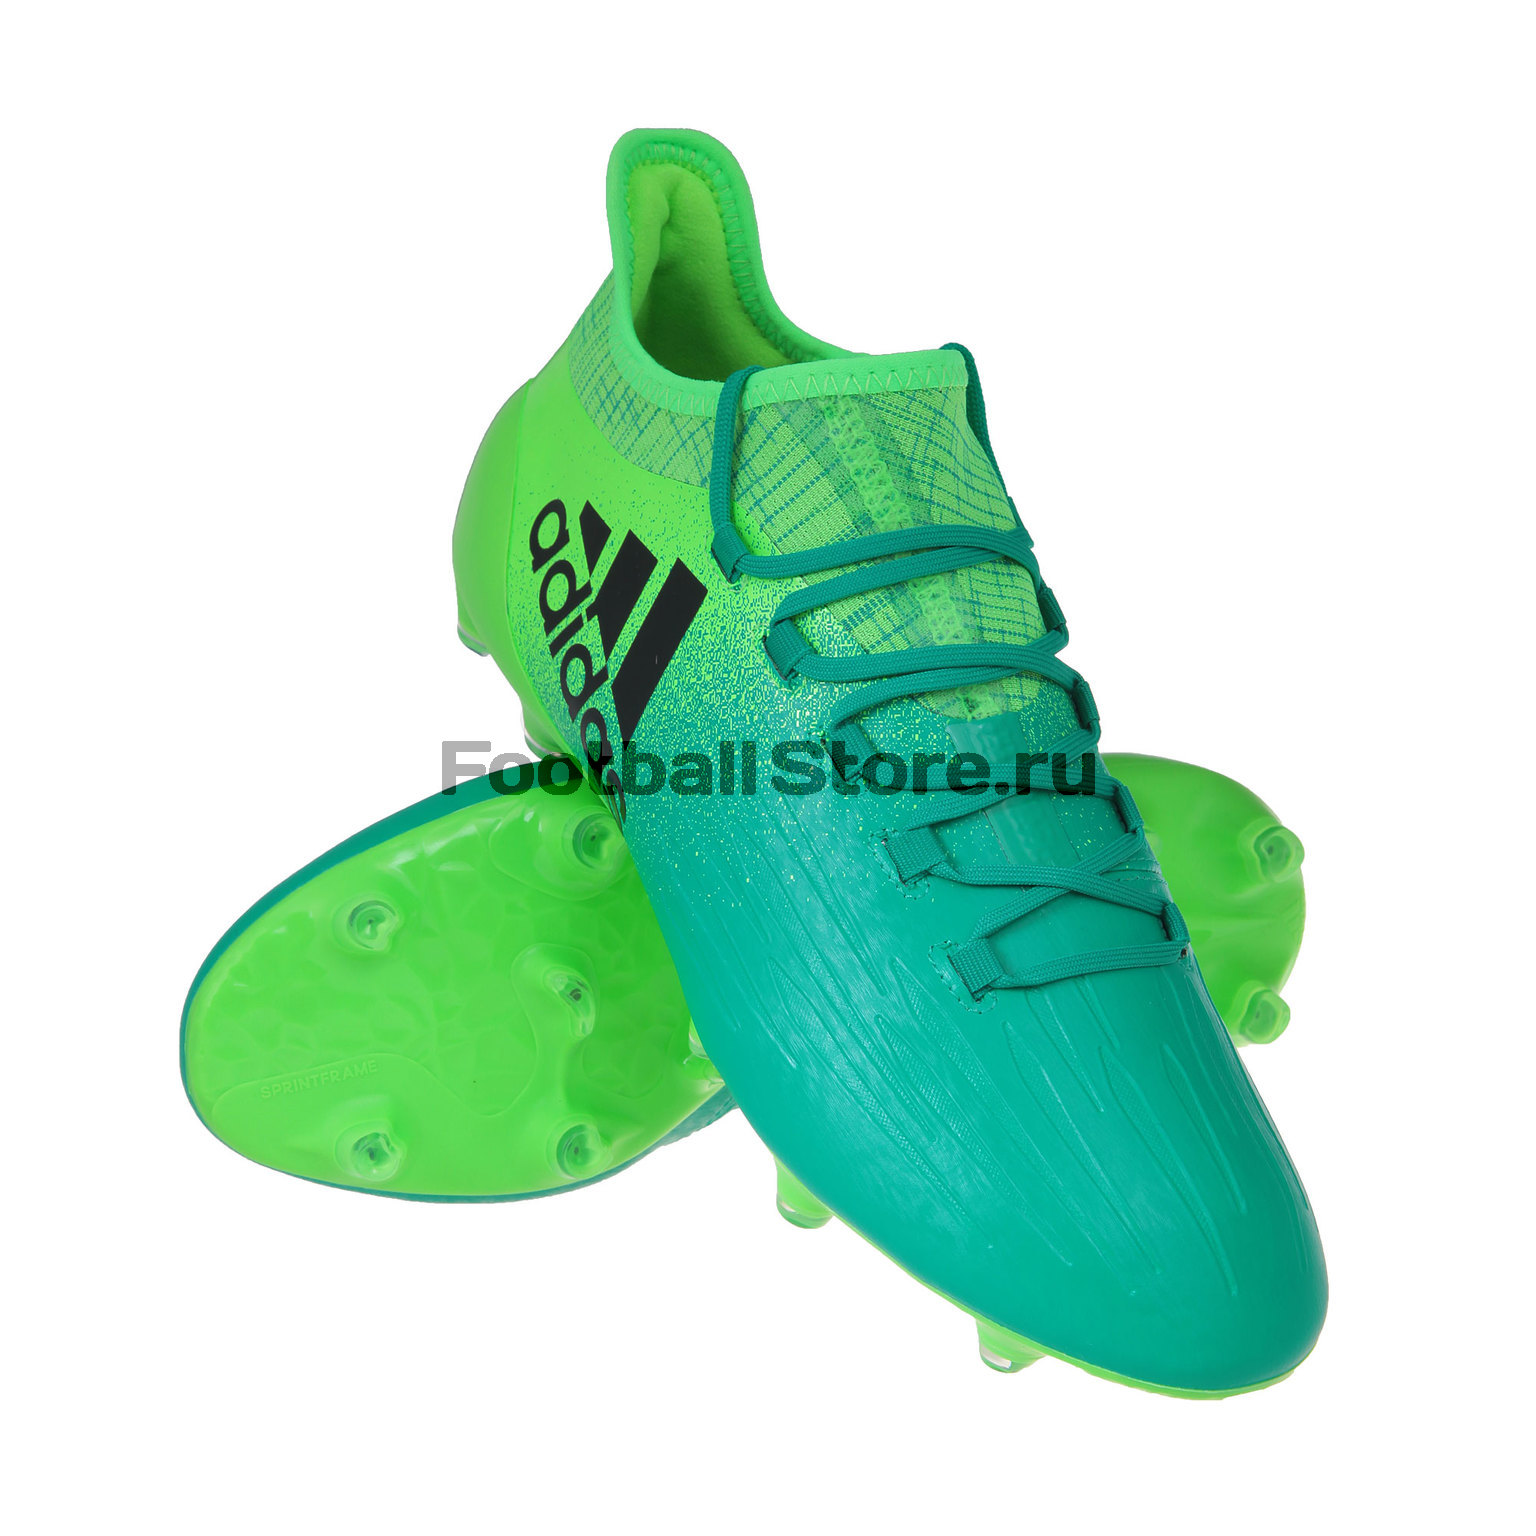 Adidas Бутсы Adidas X 16.1 FG BB5839